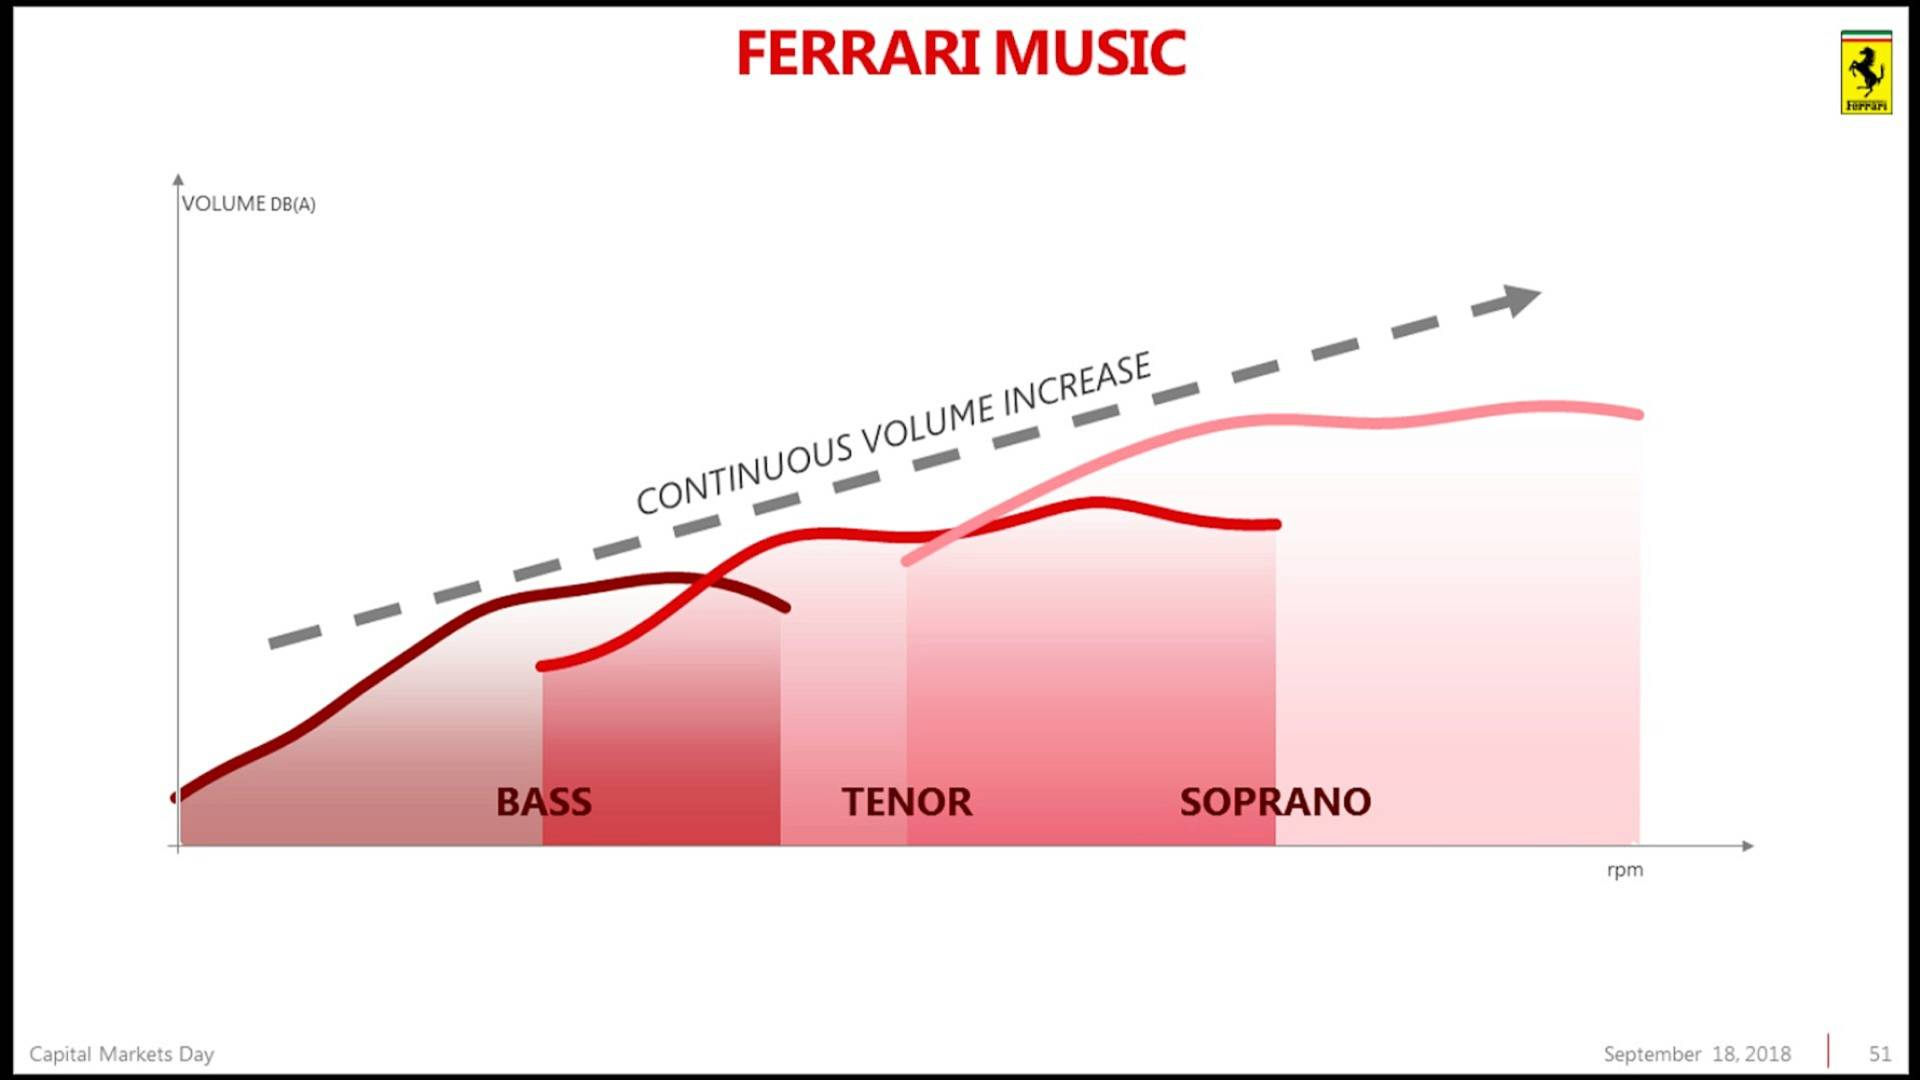 Piano Industriale Ferrari 2018-2022 (42)